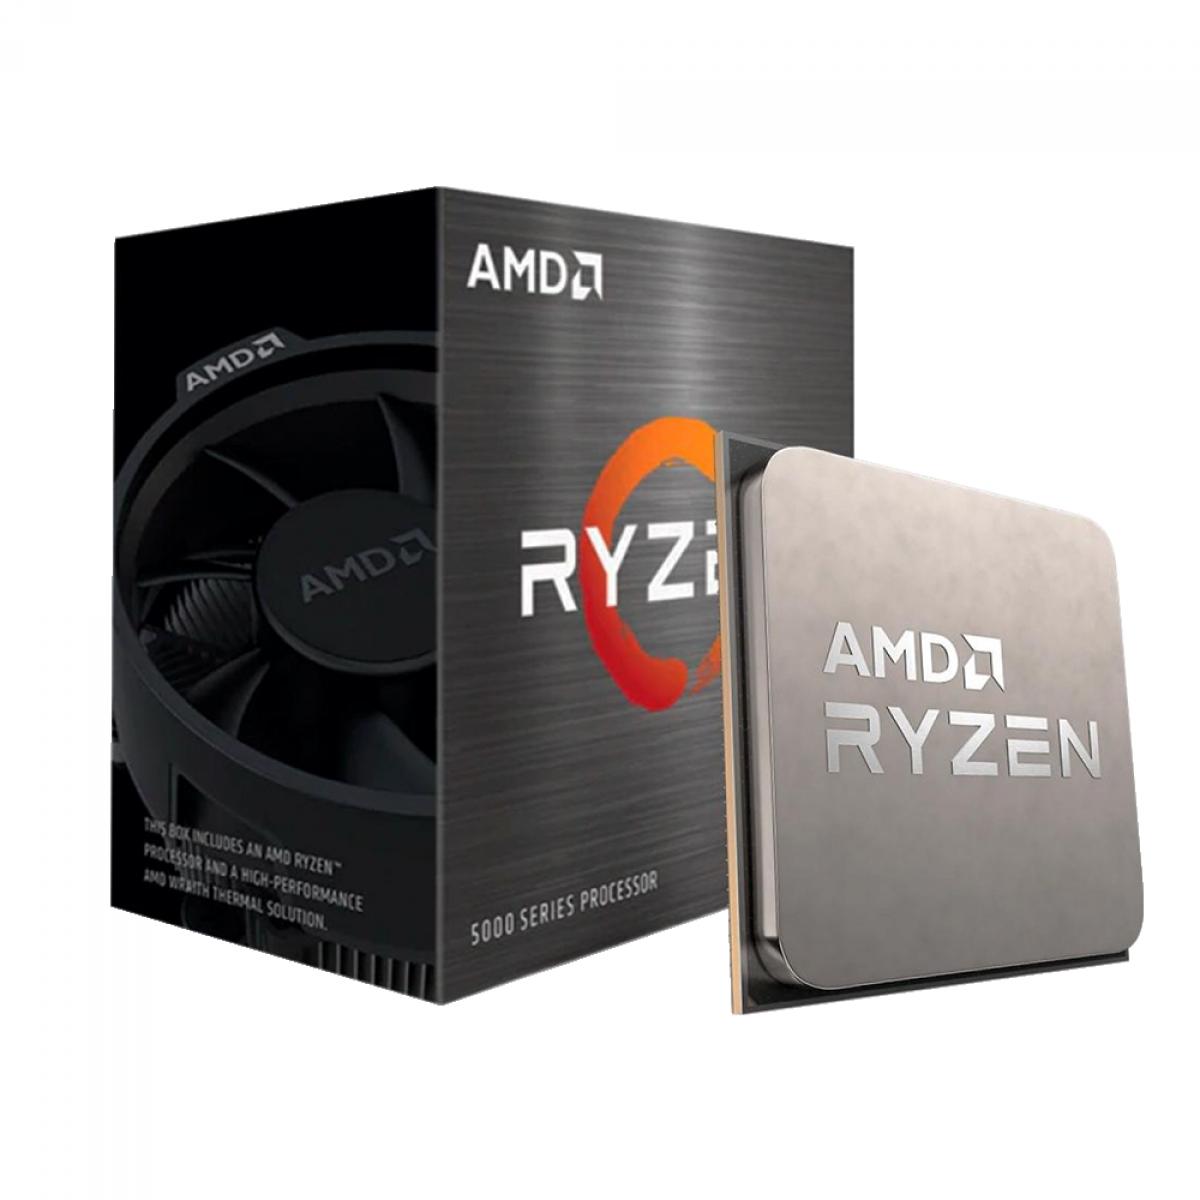 Kit Upgrade, MSI B550M PRO DASH + AMD Ryzen 5 5600G